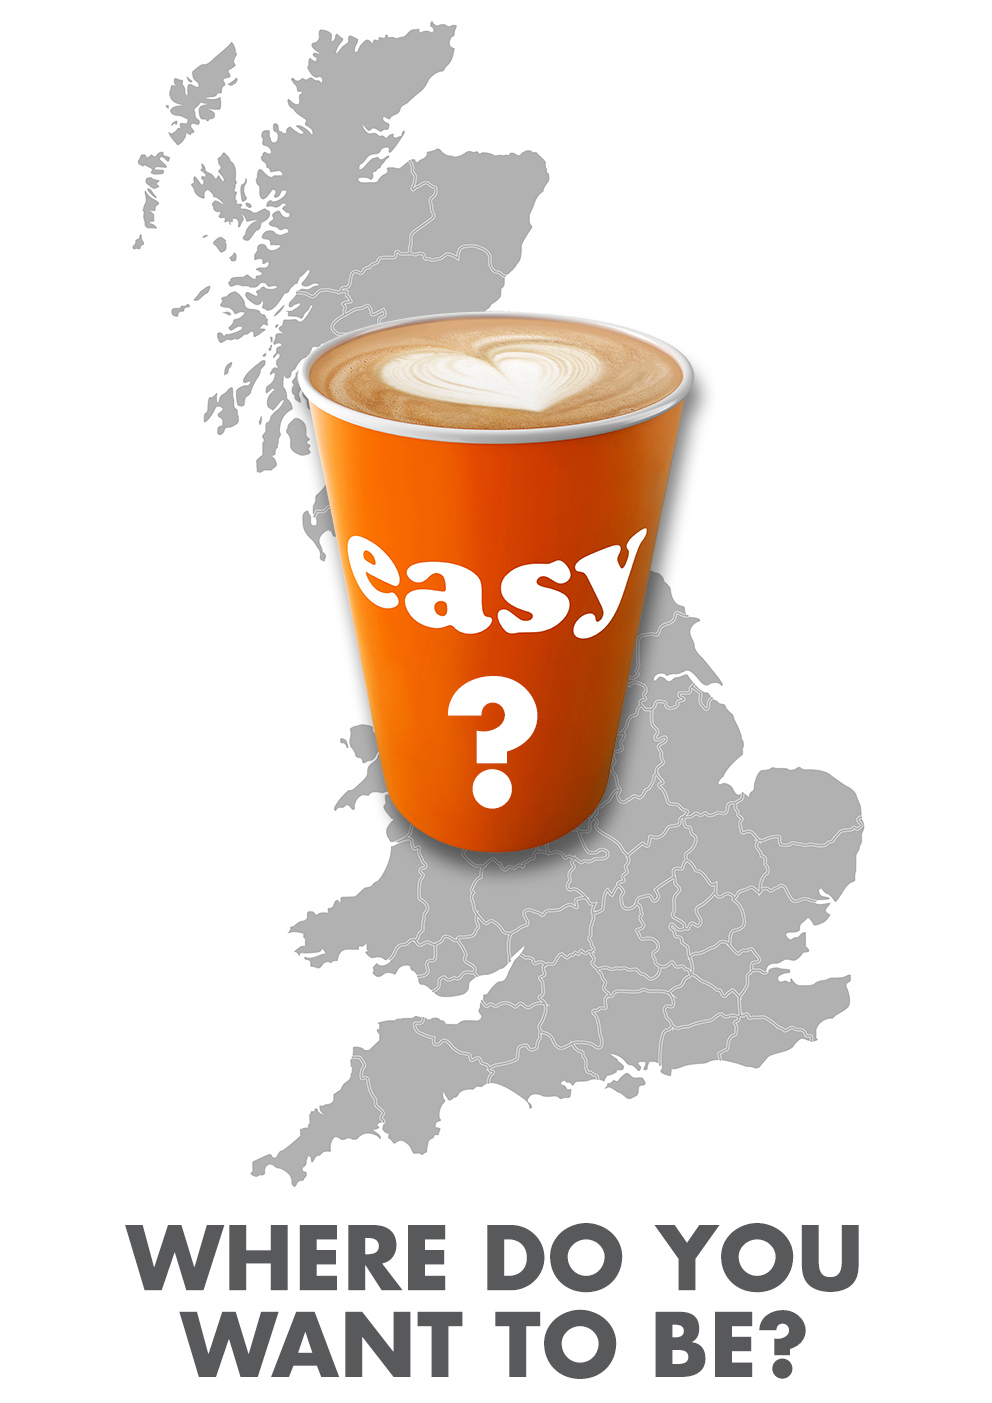 UK map_question.jpg